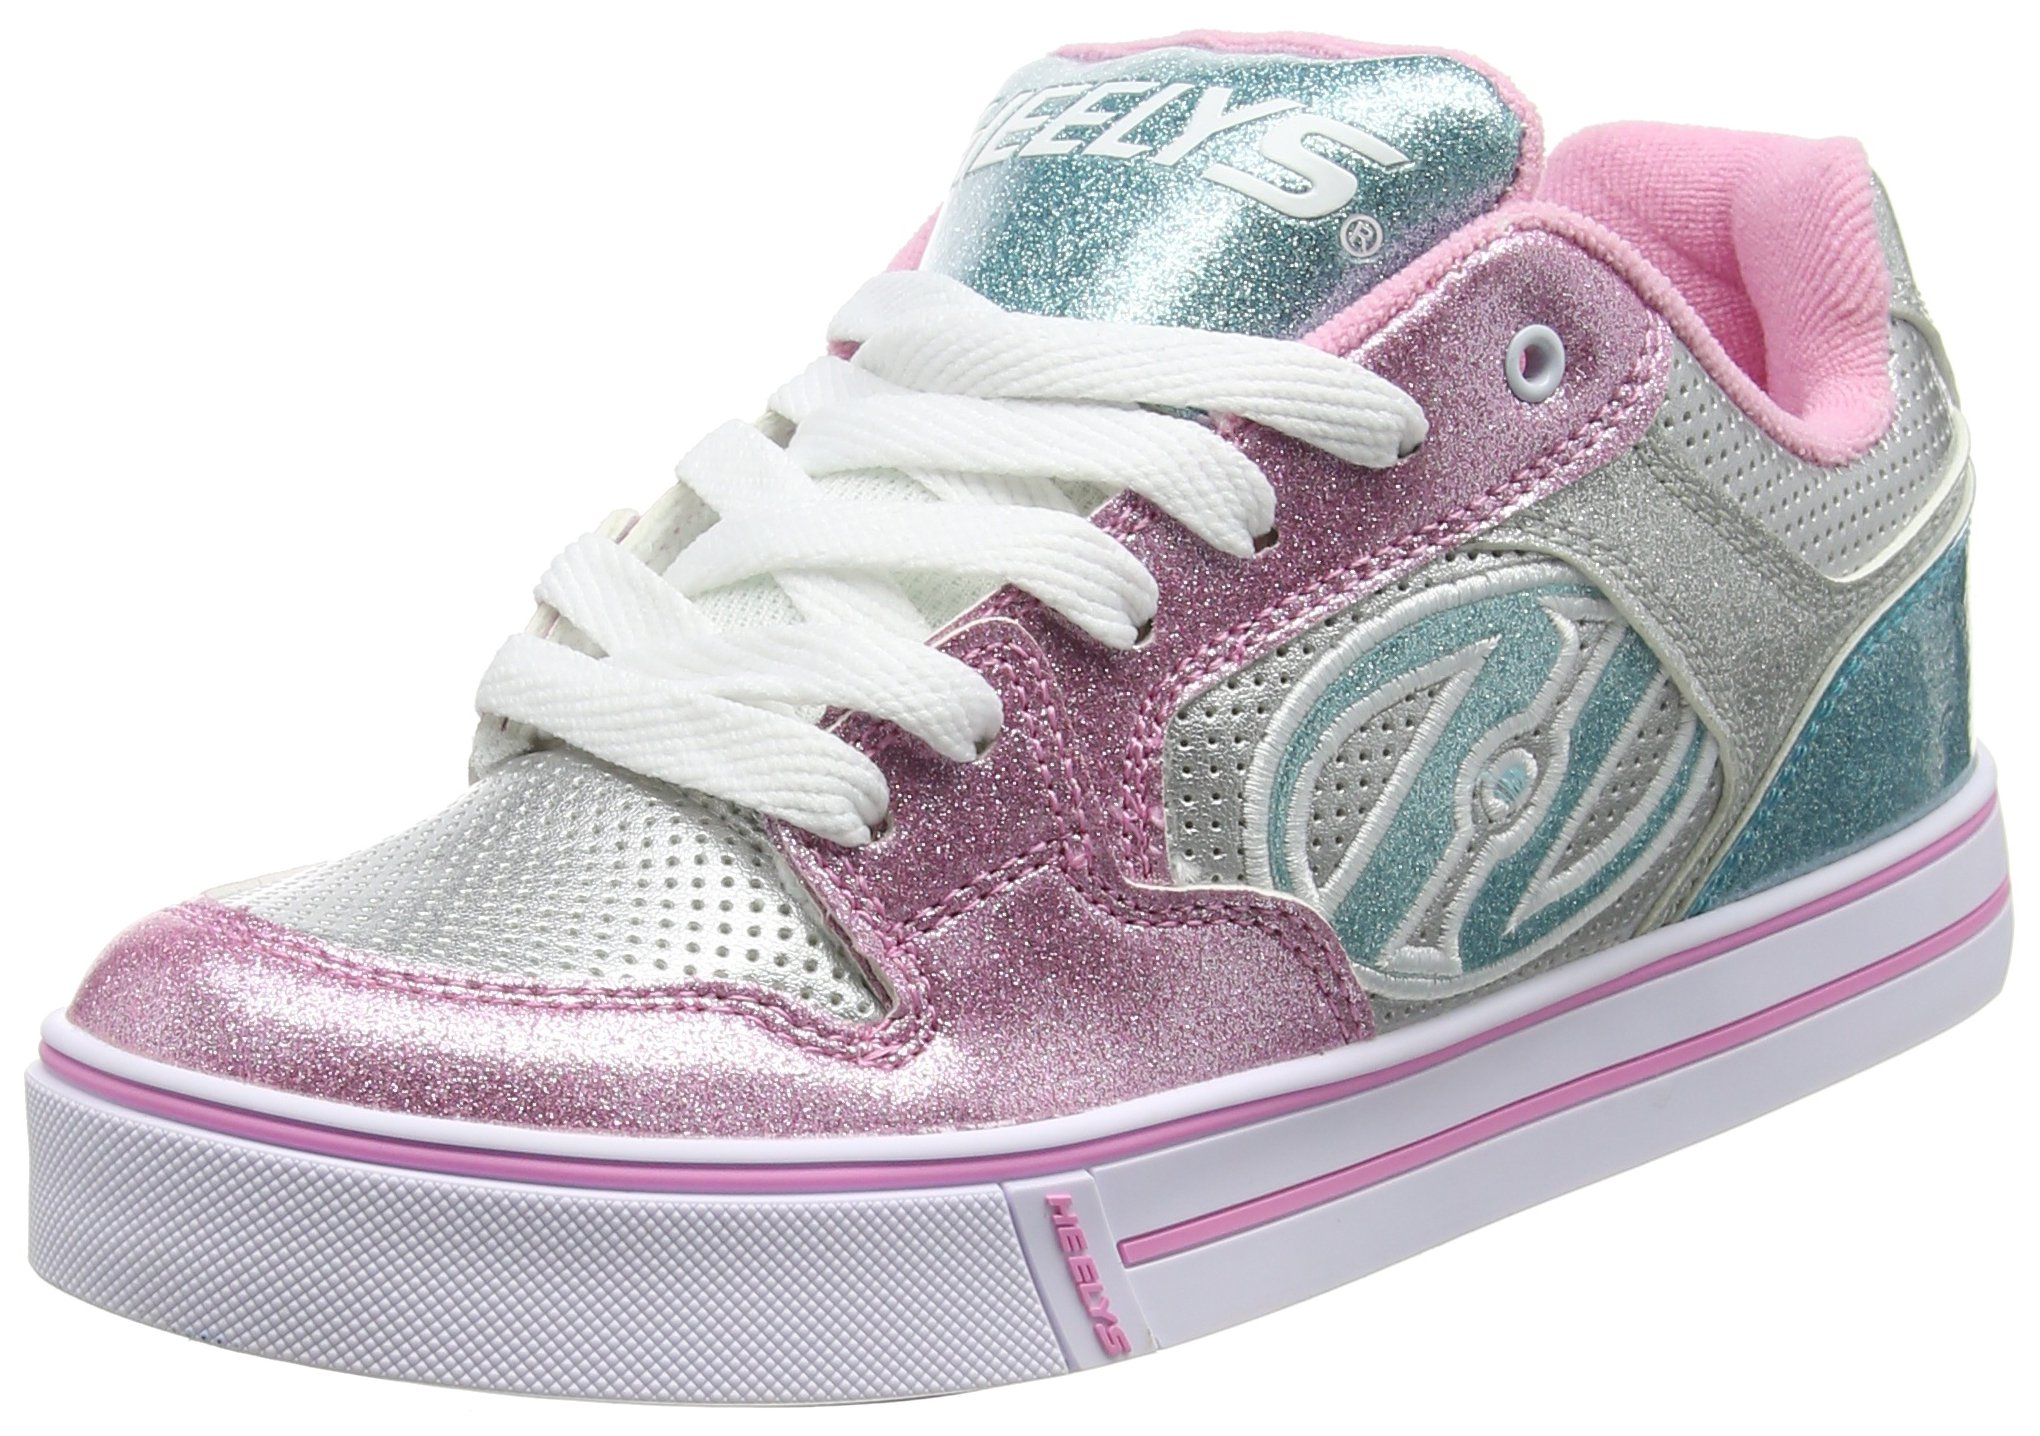 Heelys Motion Plus Silver//Light Pink/Light Blue Kids Kids 4US by Heelys